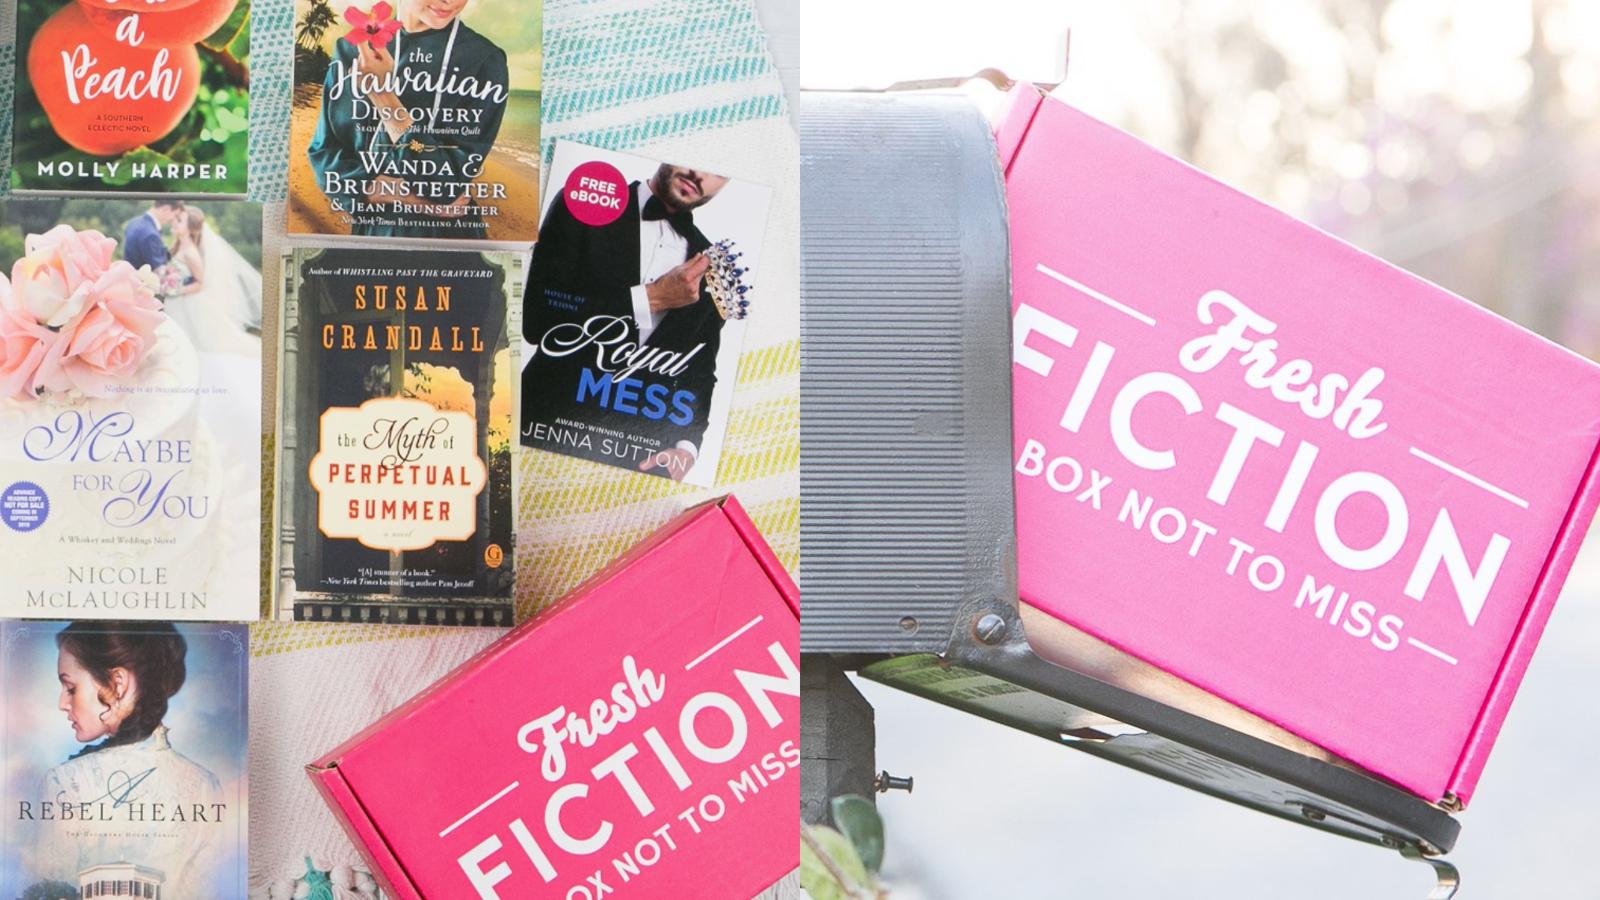 Fresh Fiction Box books and box in mailbox